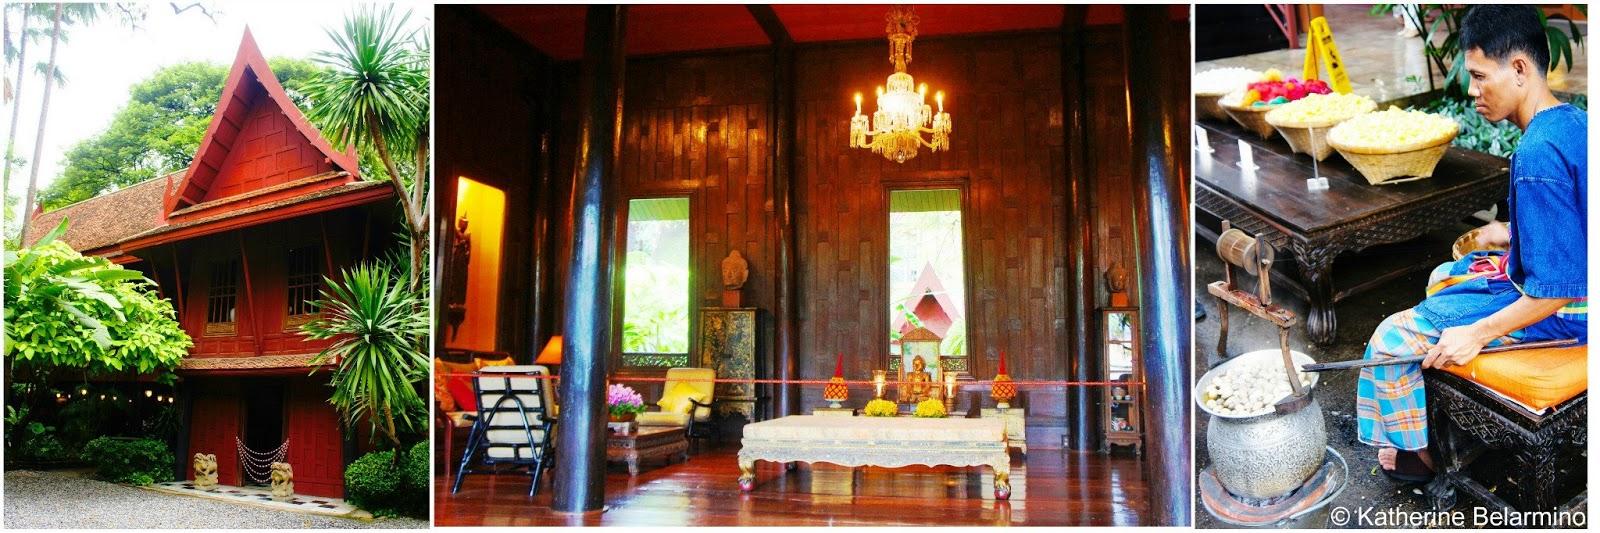 Bangkok s wat saket the golden mount and jim thompson for Thai silk jim thompson